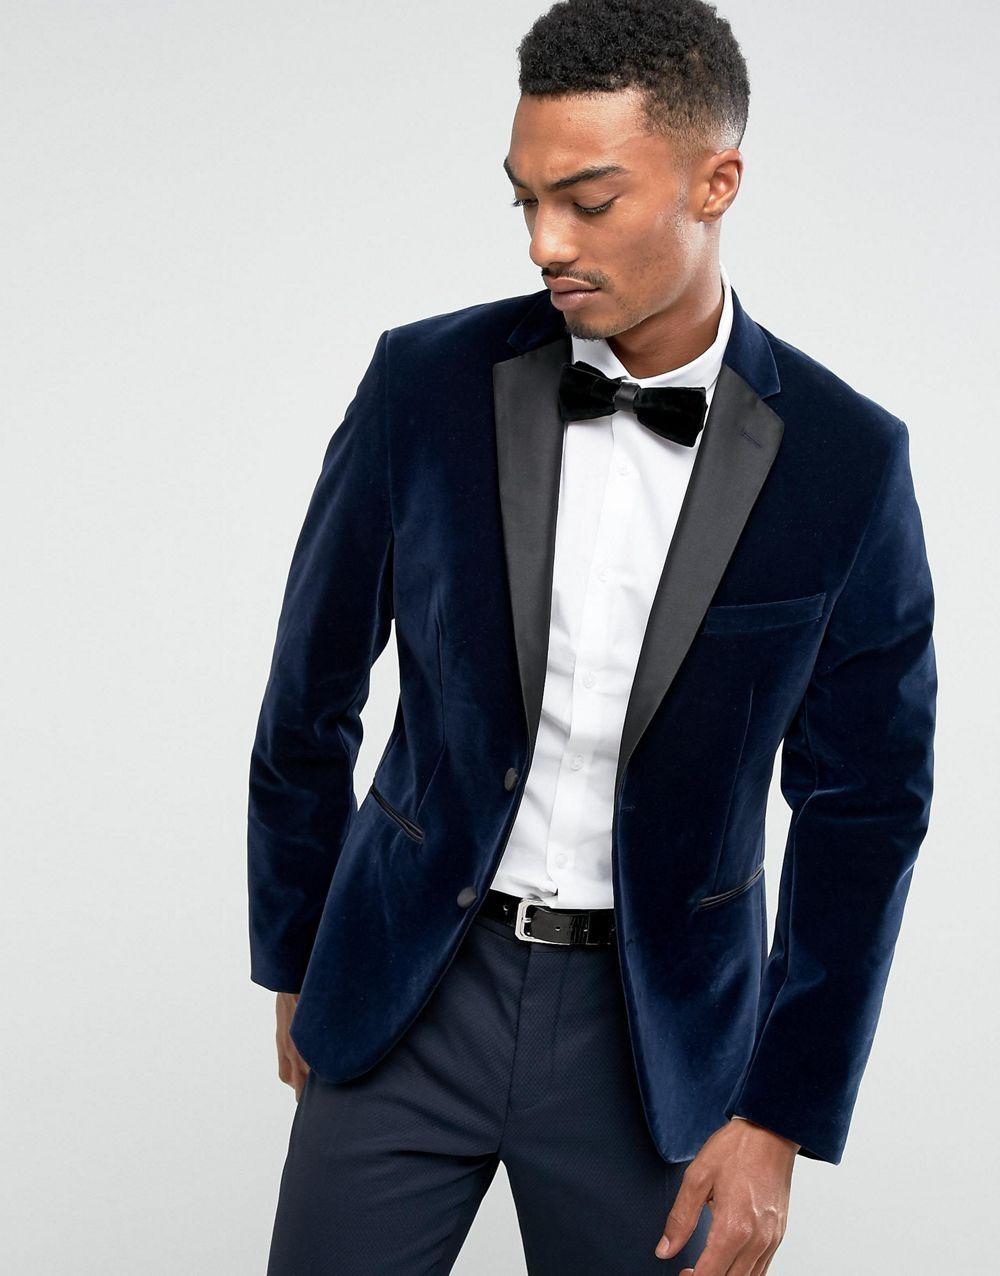 Wedding dress suit   slim fit Latest Coat Designs velvet Jacket plus Wedding Dress